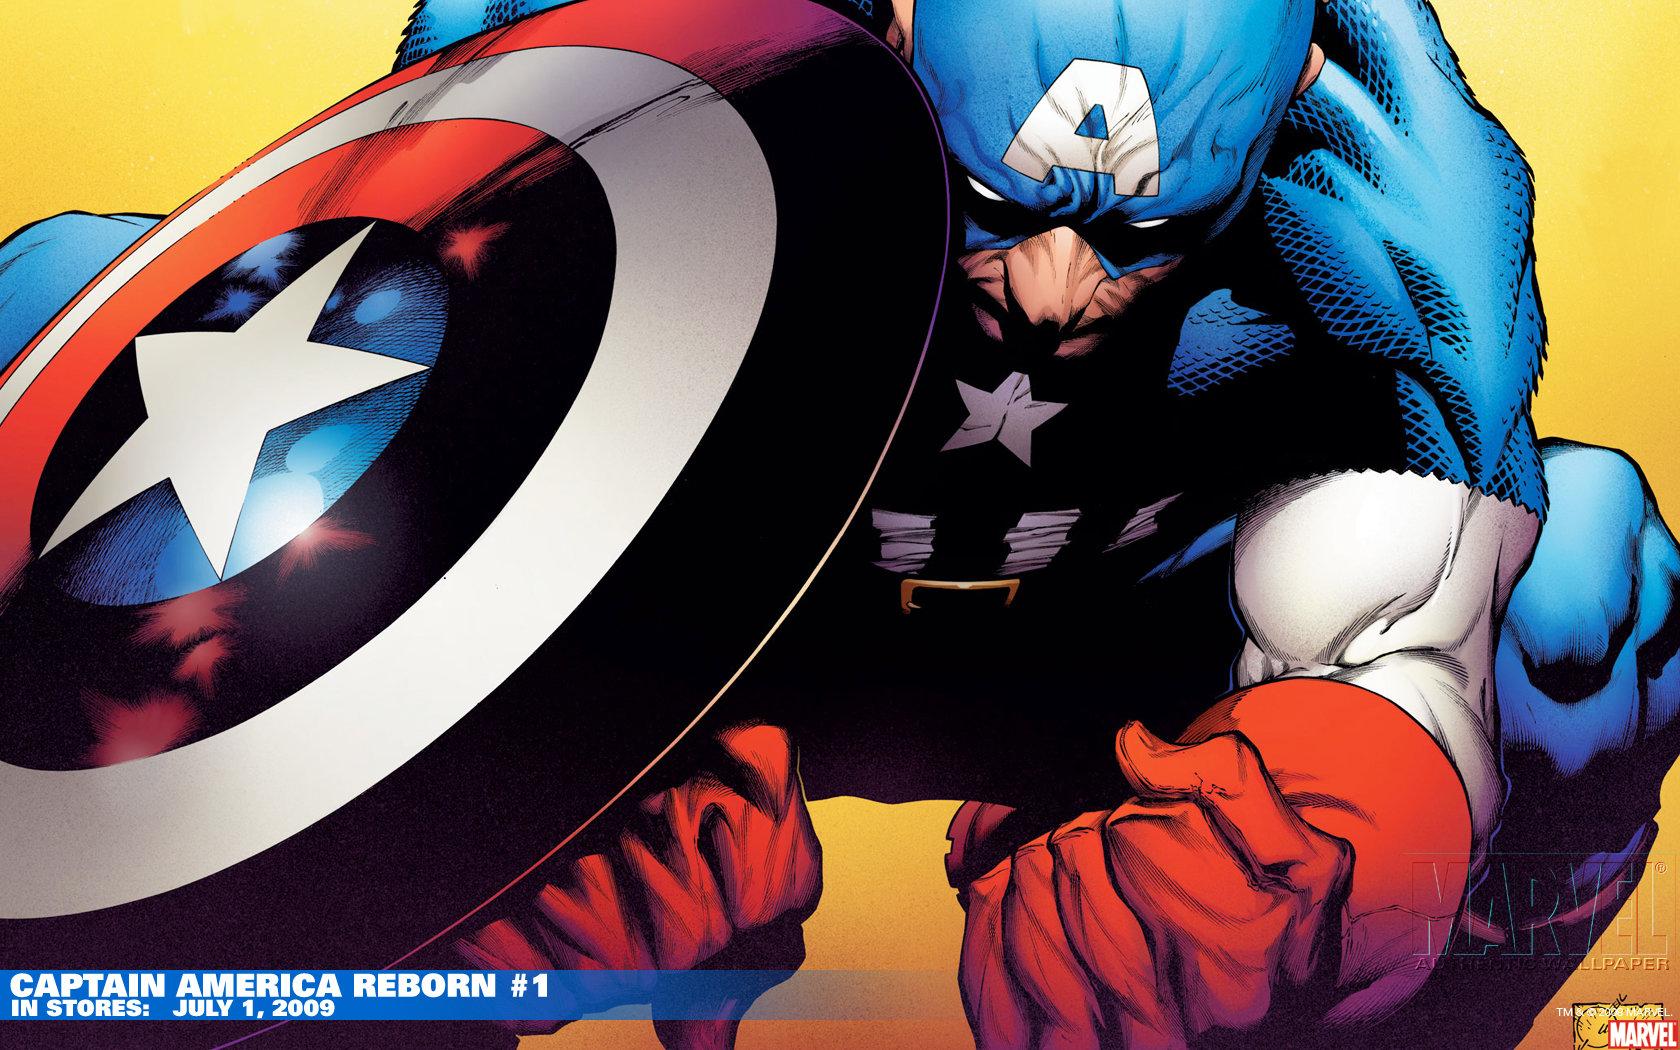 Captain America Hd Wallpaper Group HD